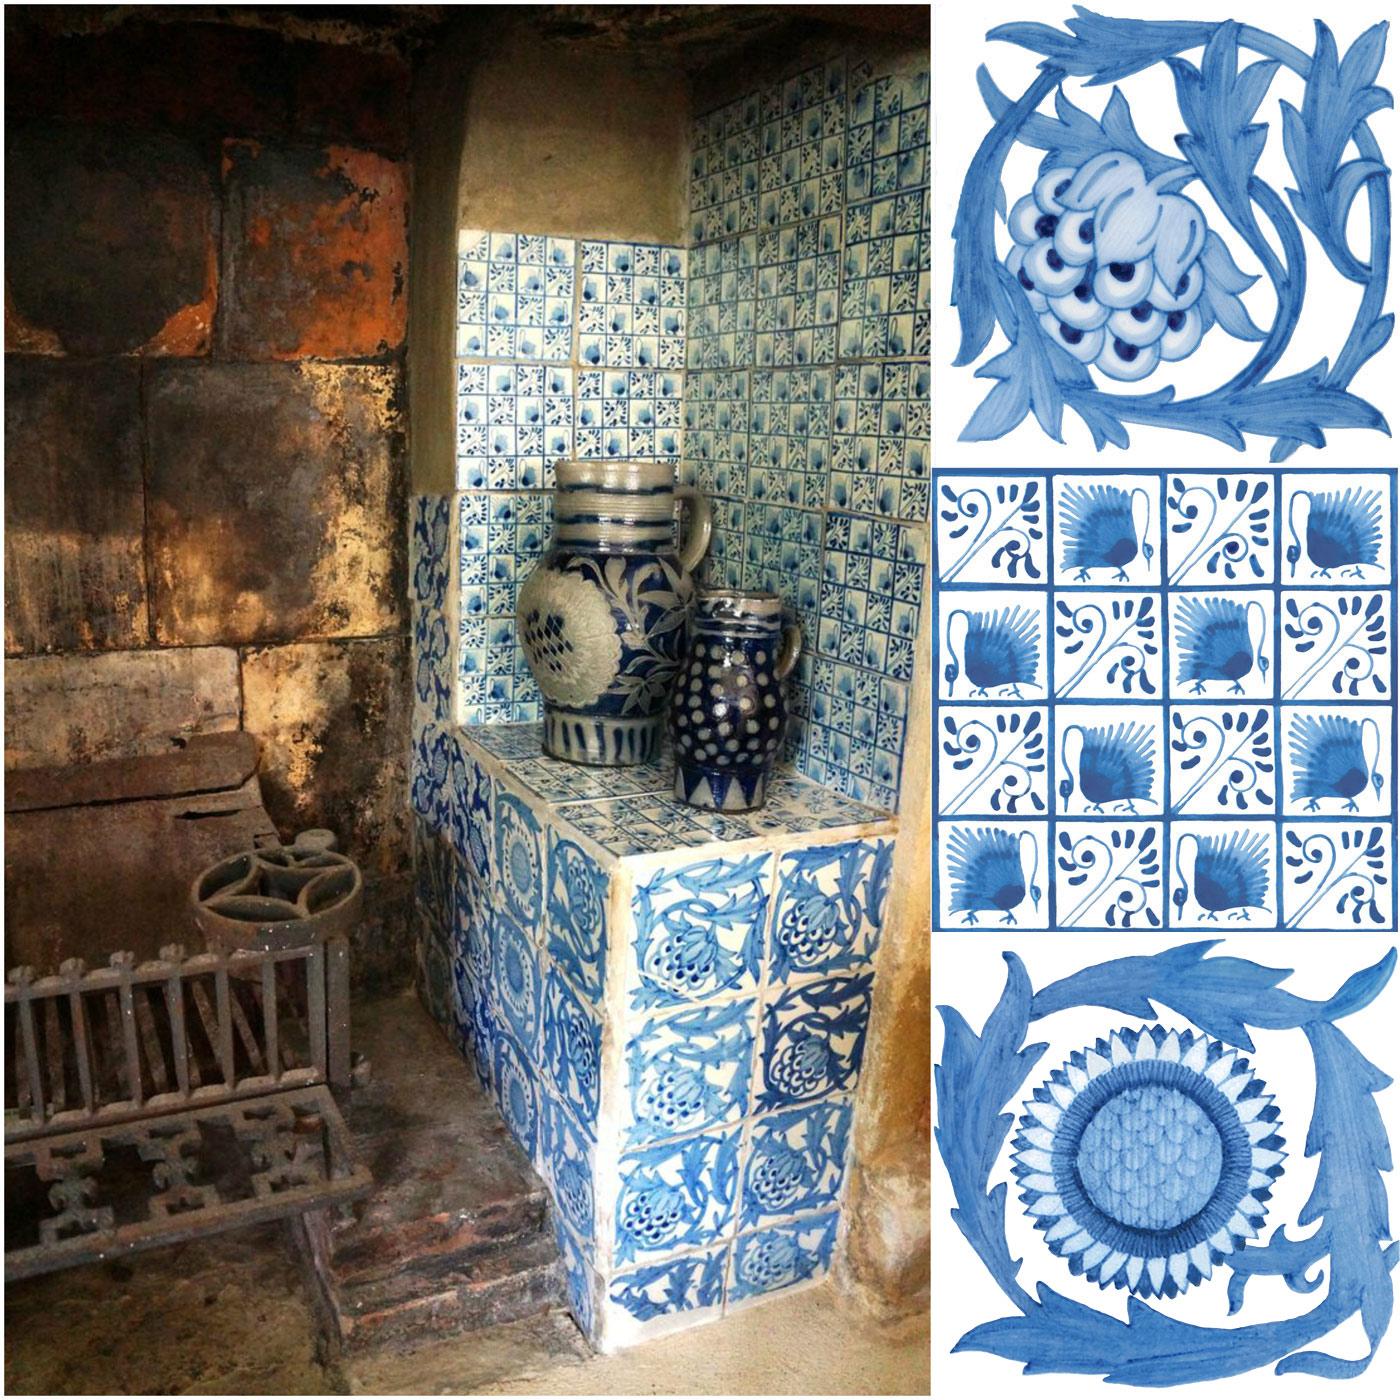 Kelmscott Manor: Green Drawing Room Fireplace Tiles